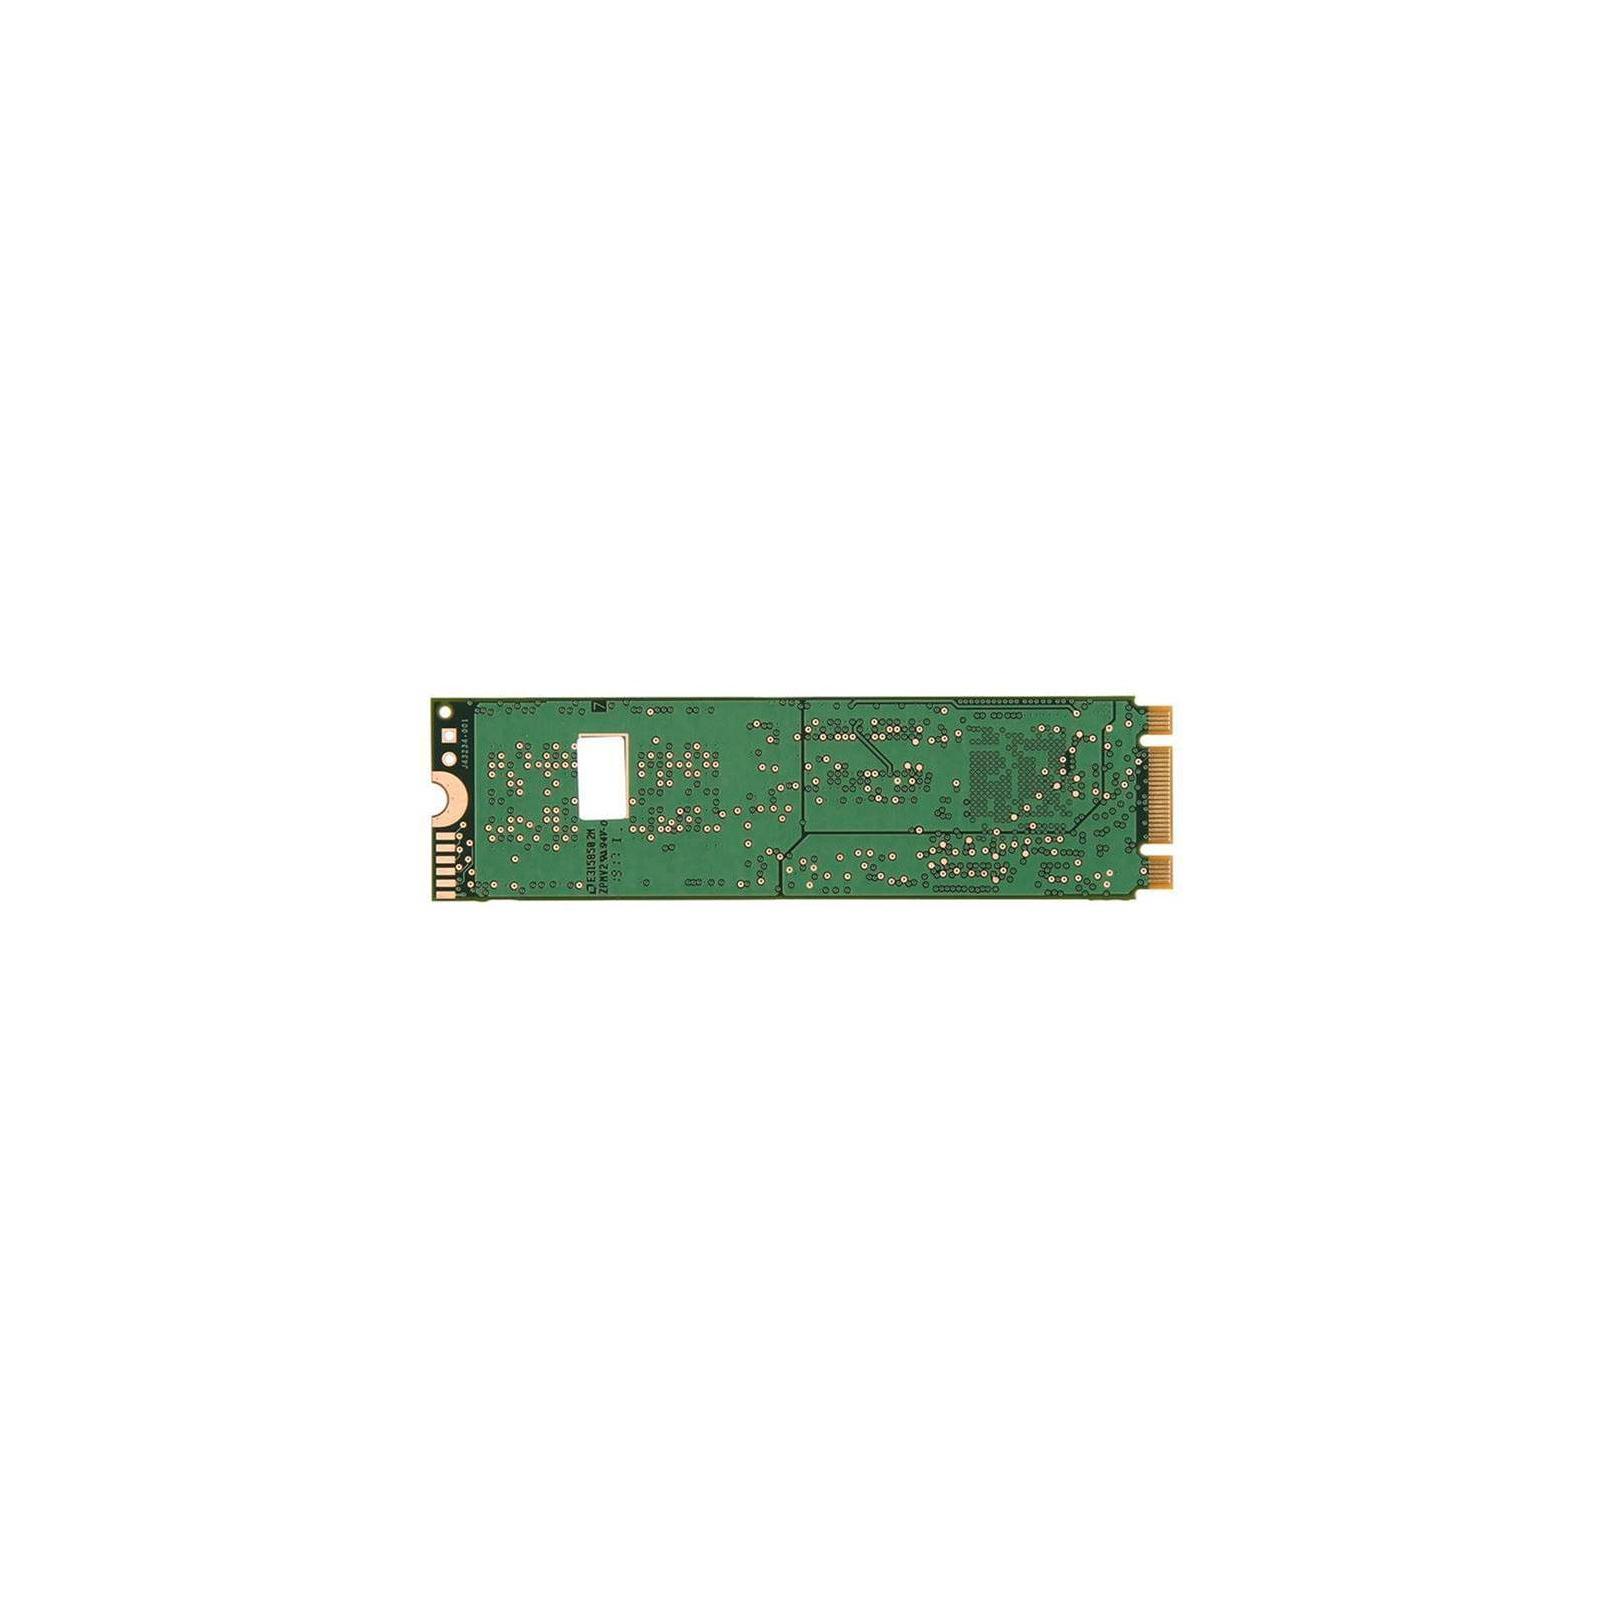 Накопитель SSD M.2 2280 128GB INTEL (SSDSCKKW128G8X1) изображение 2